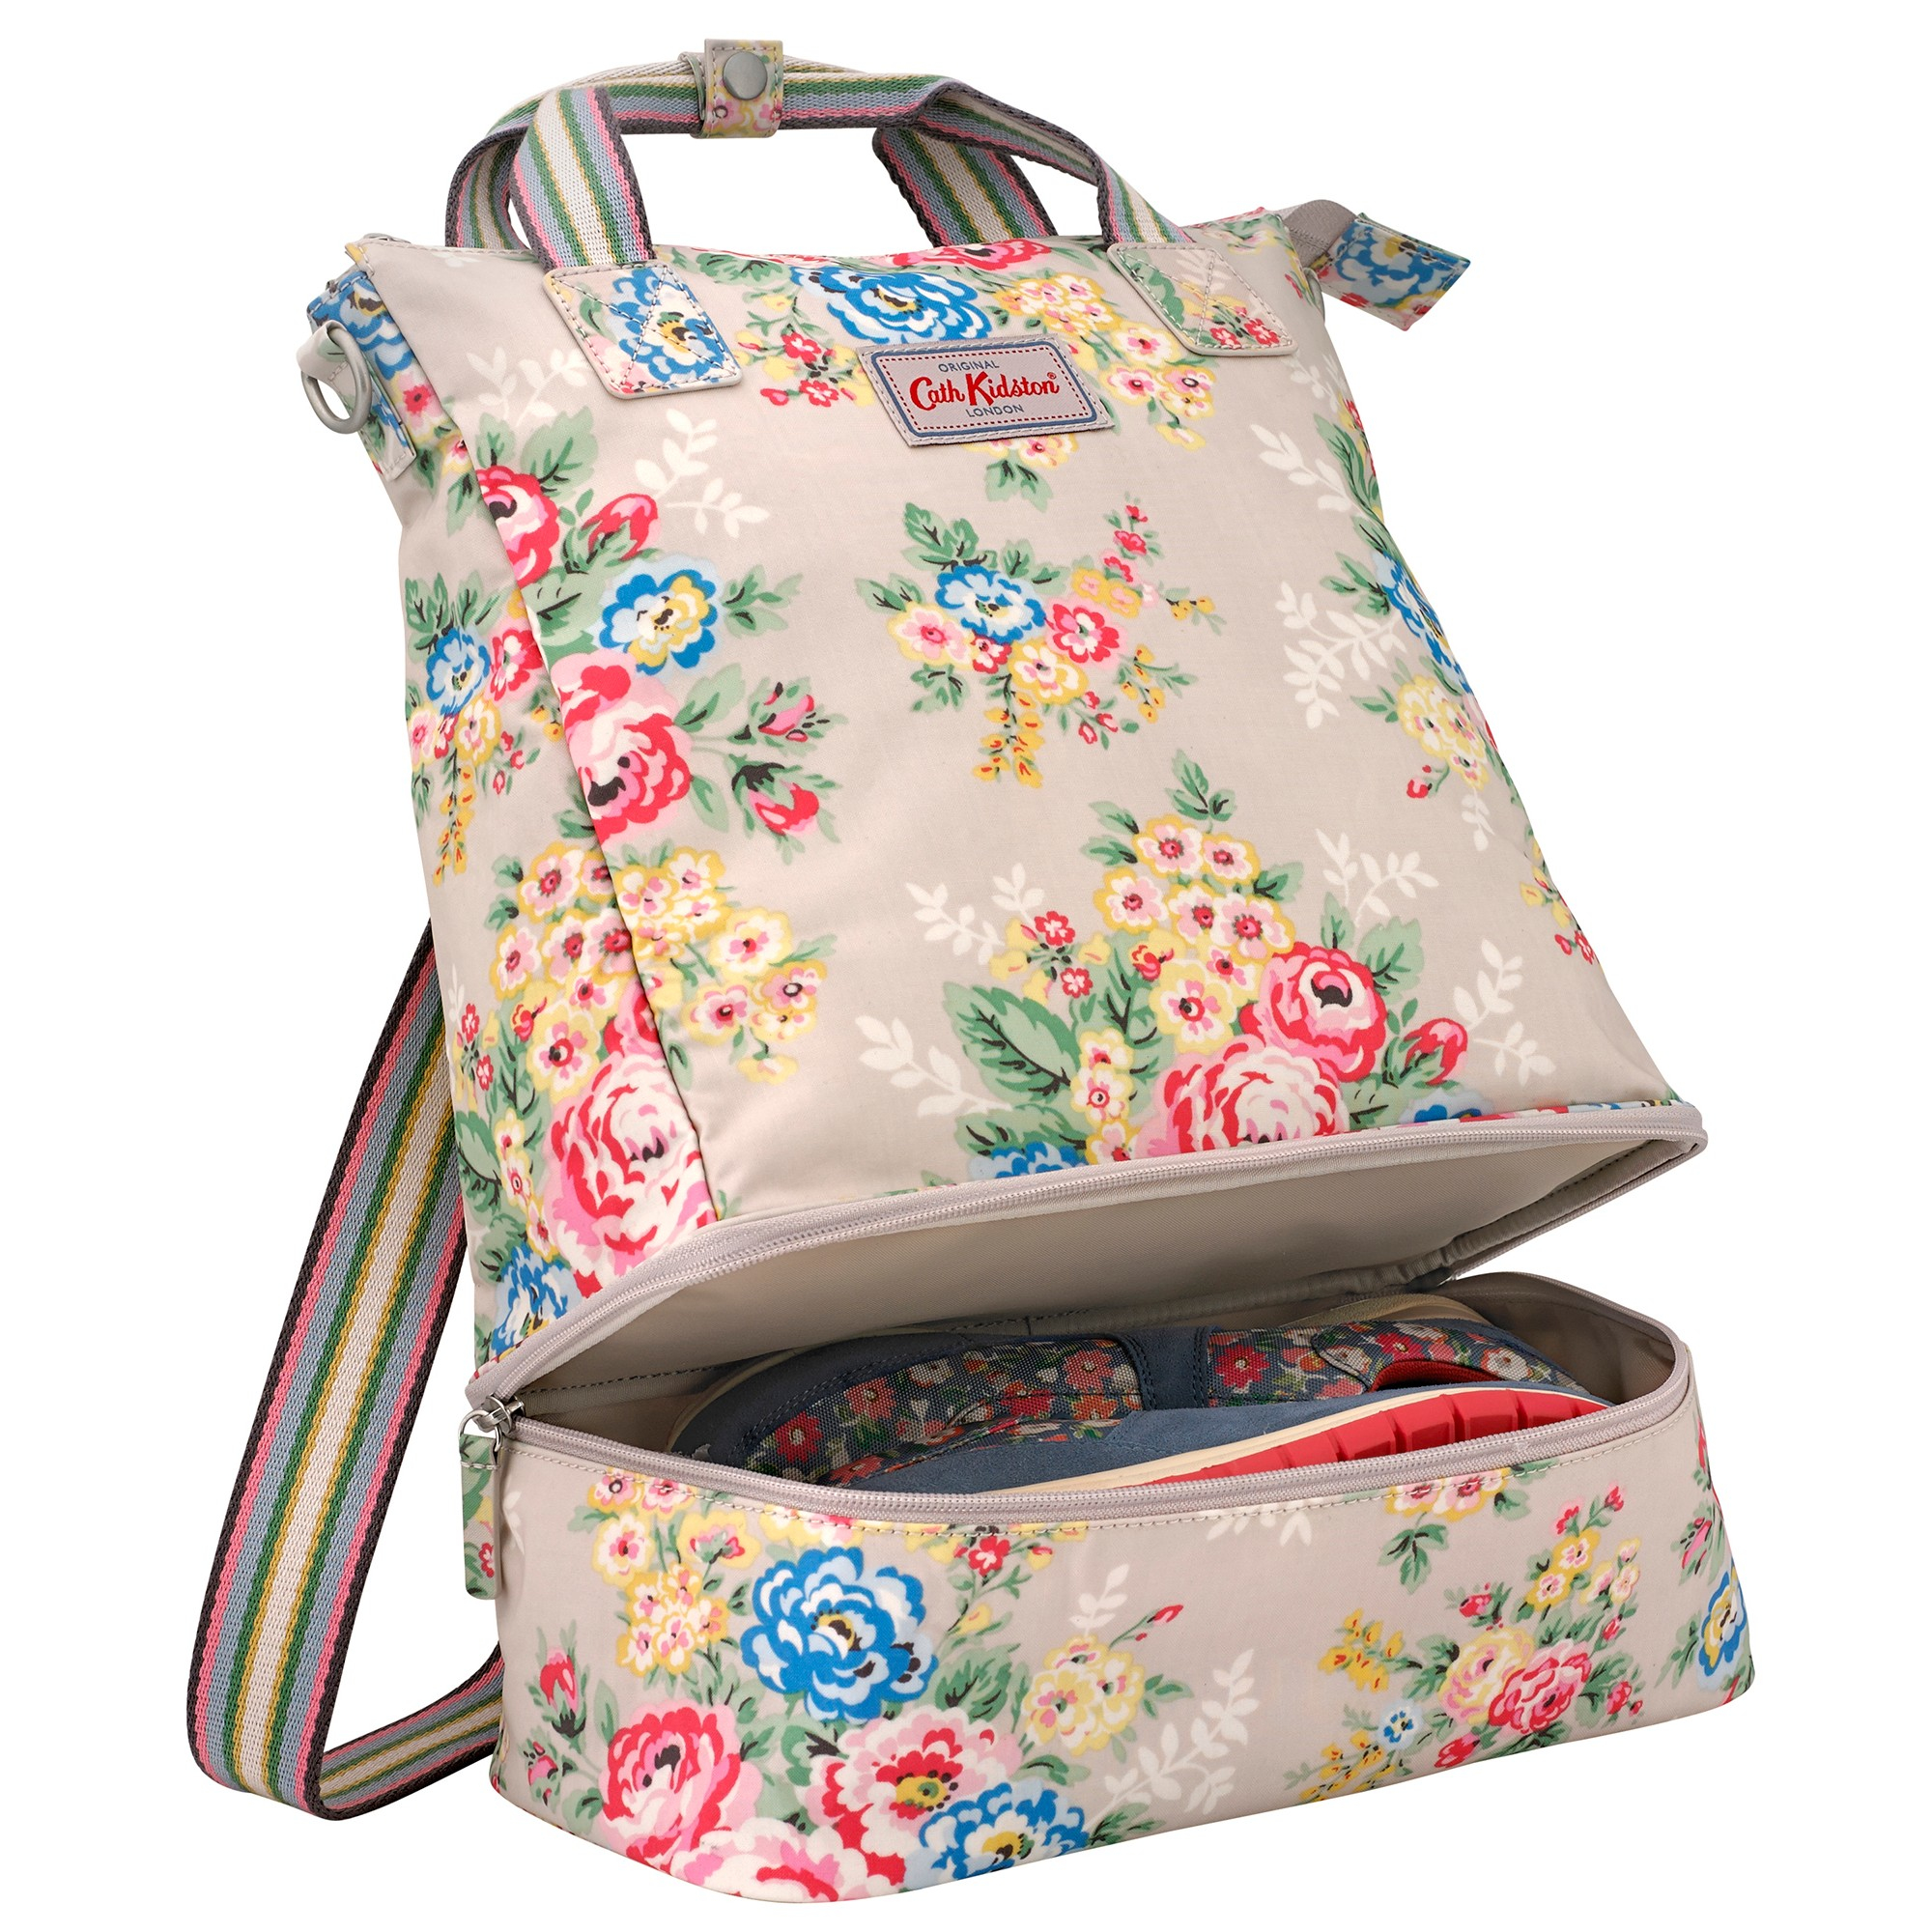 lyst cath kidston double decker backpack. Black Bedroom Furniture Sets. Home Design Ideas